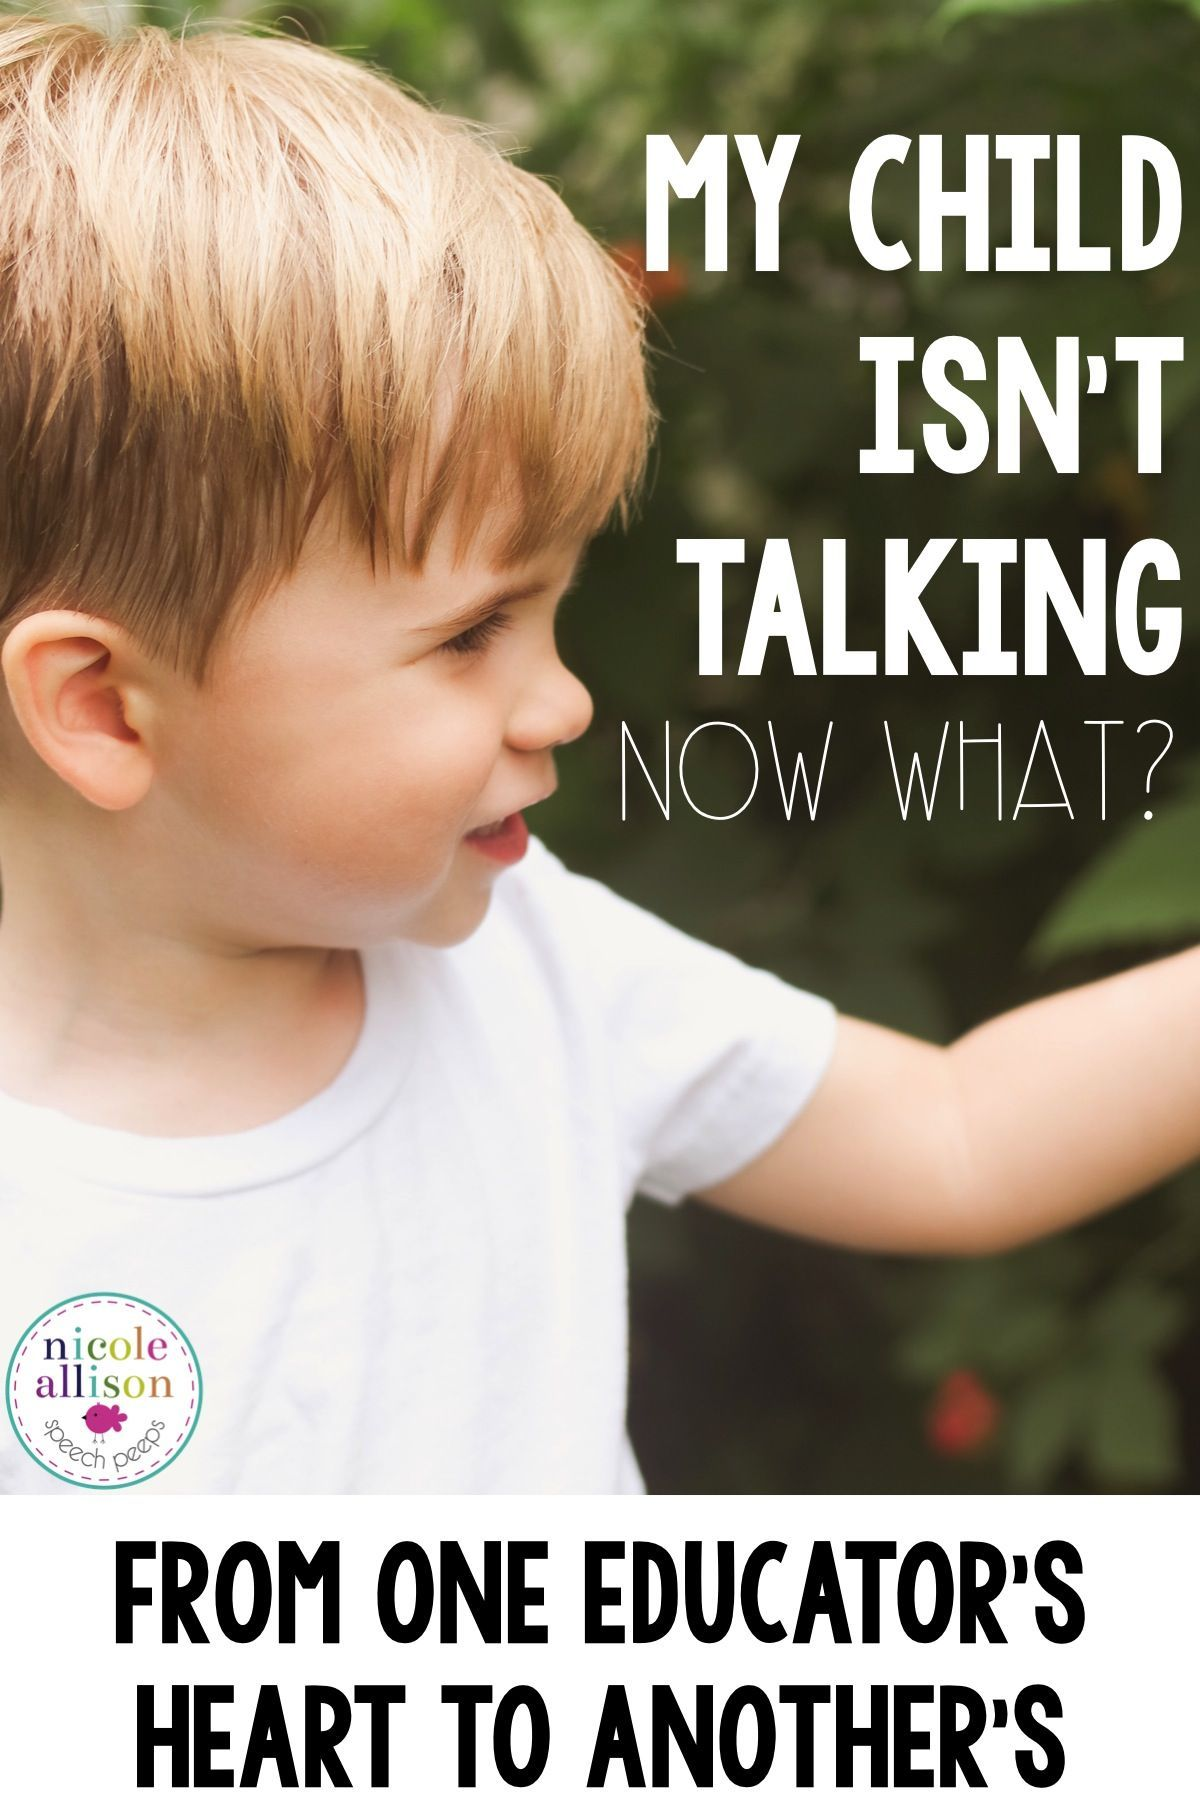 The Teacher Isnt Following My Childs >> My Child Isn T Talking Now What Slp Inspiration Speech